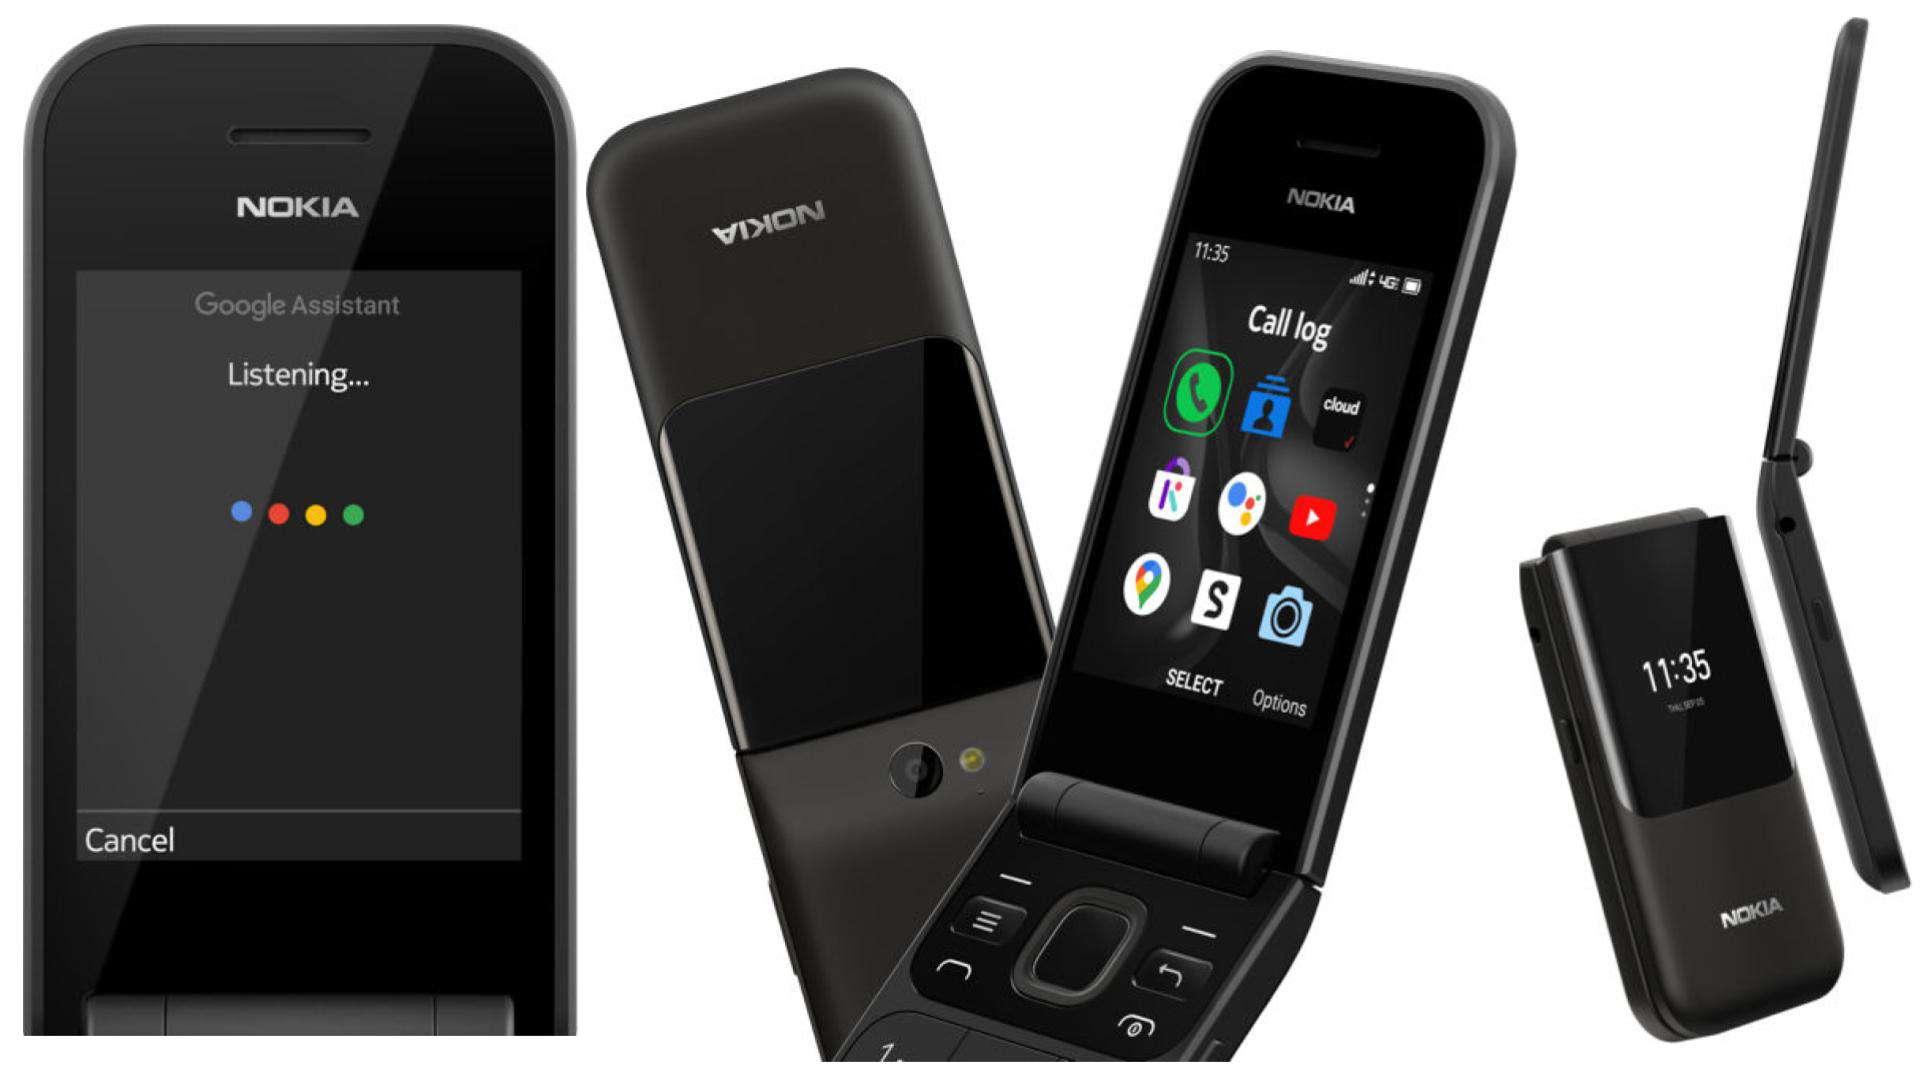 Nokia 2720 V Flip verizon presser